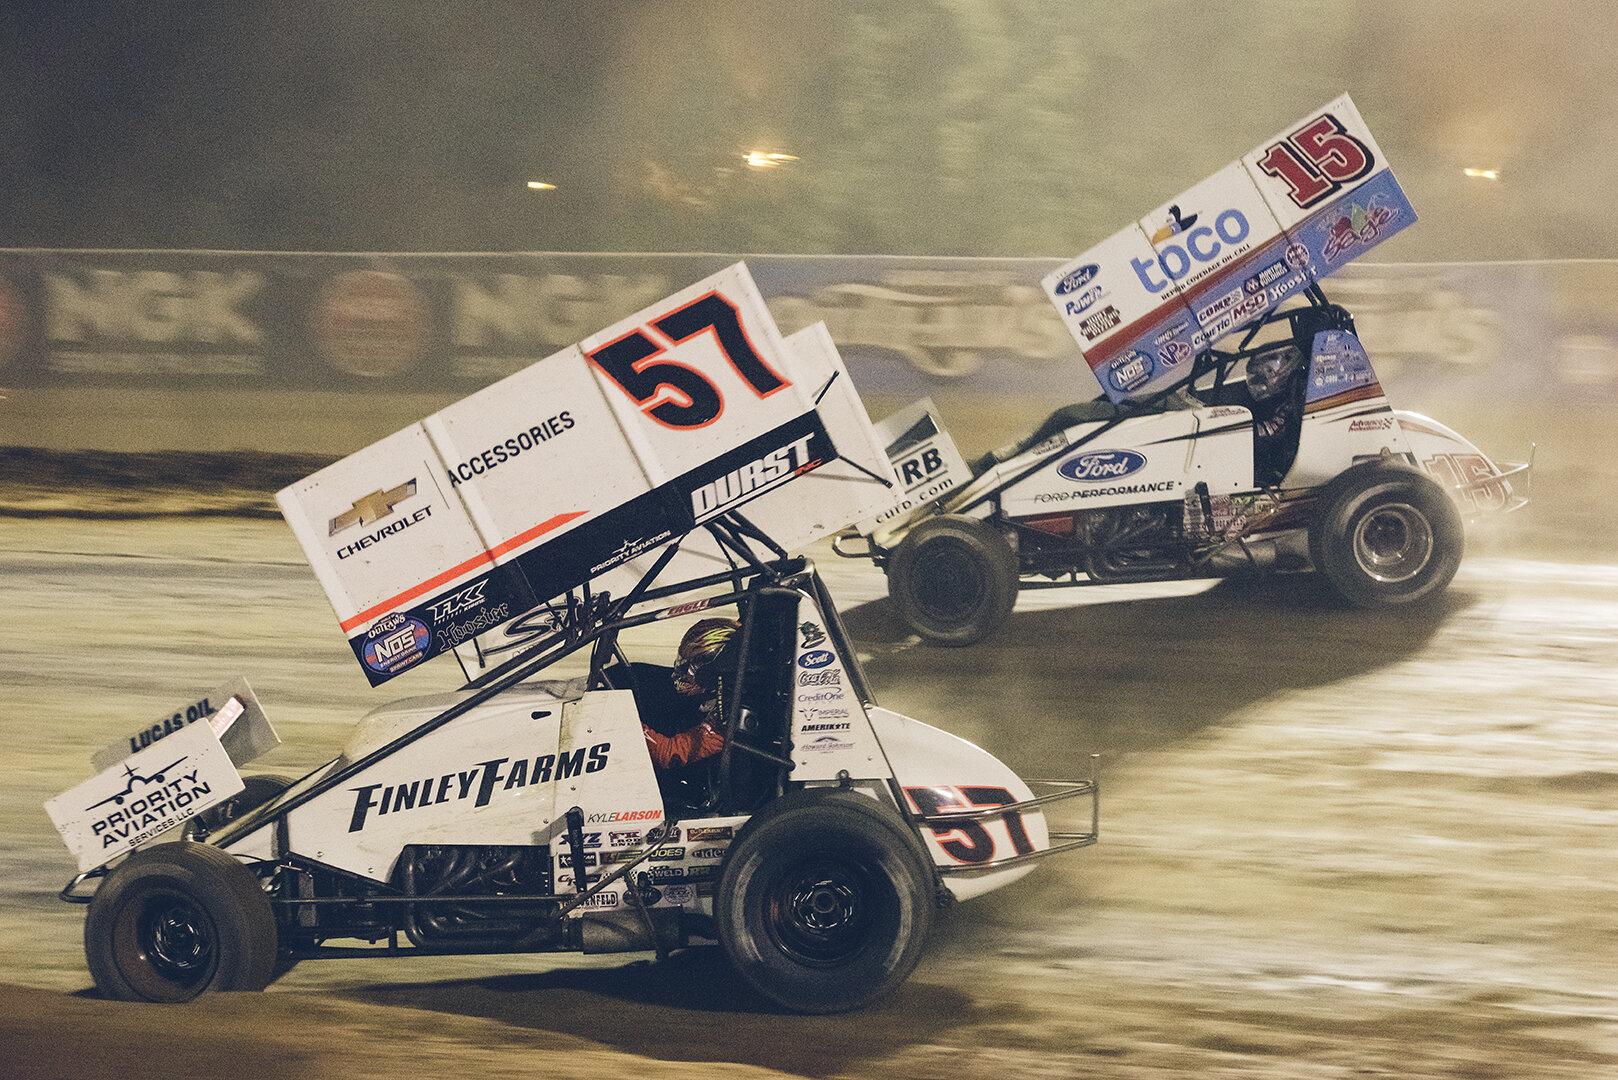 Main event action: Larson battles for position with Donny Schatz.